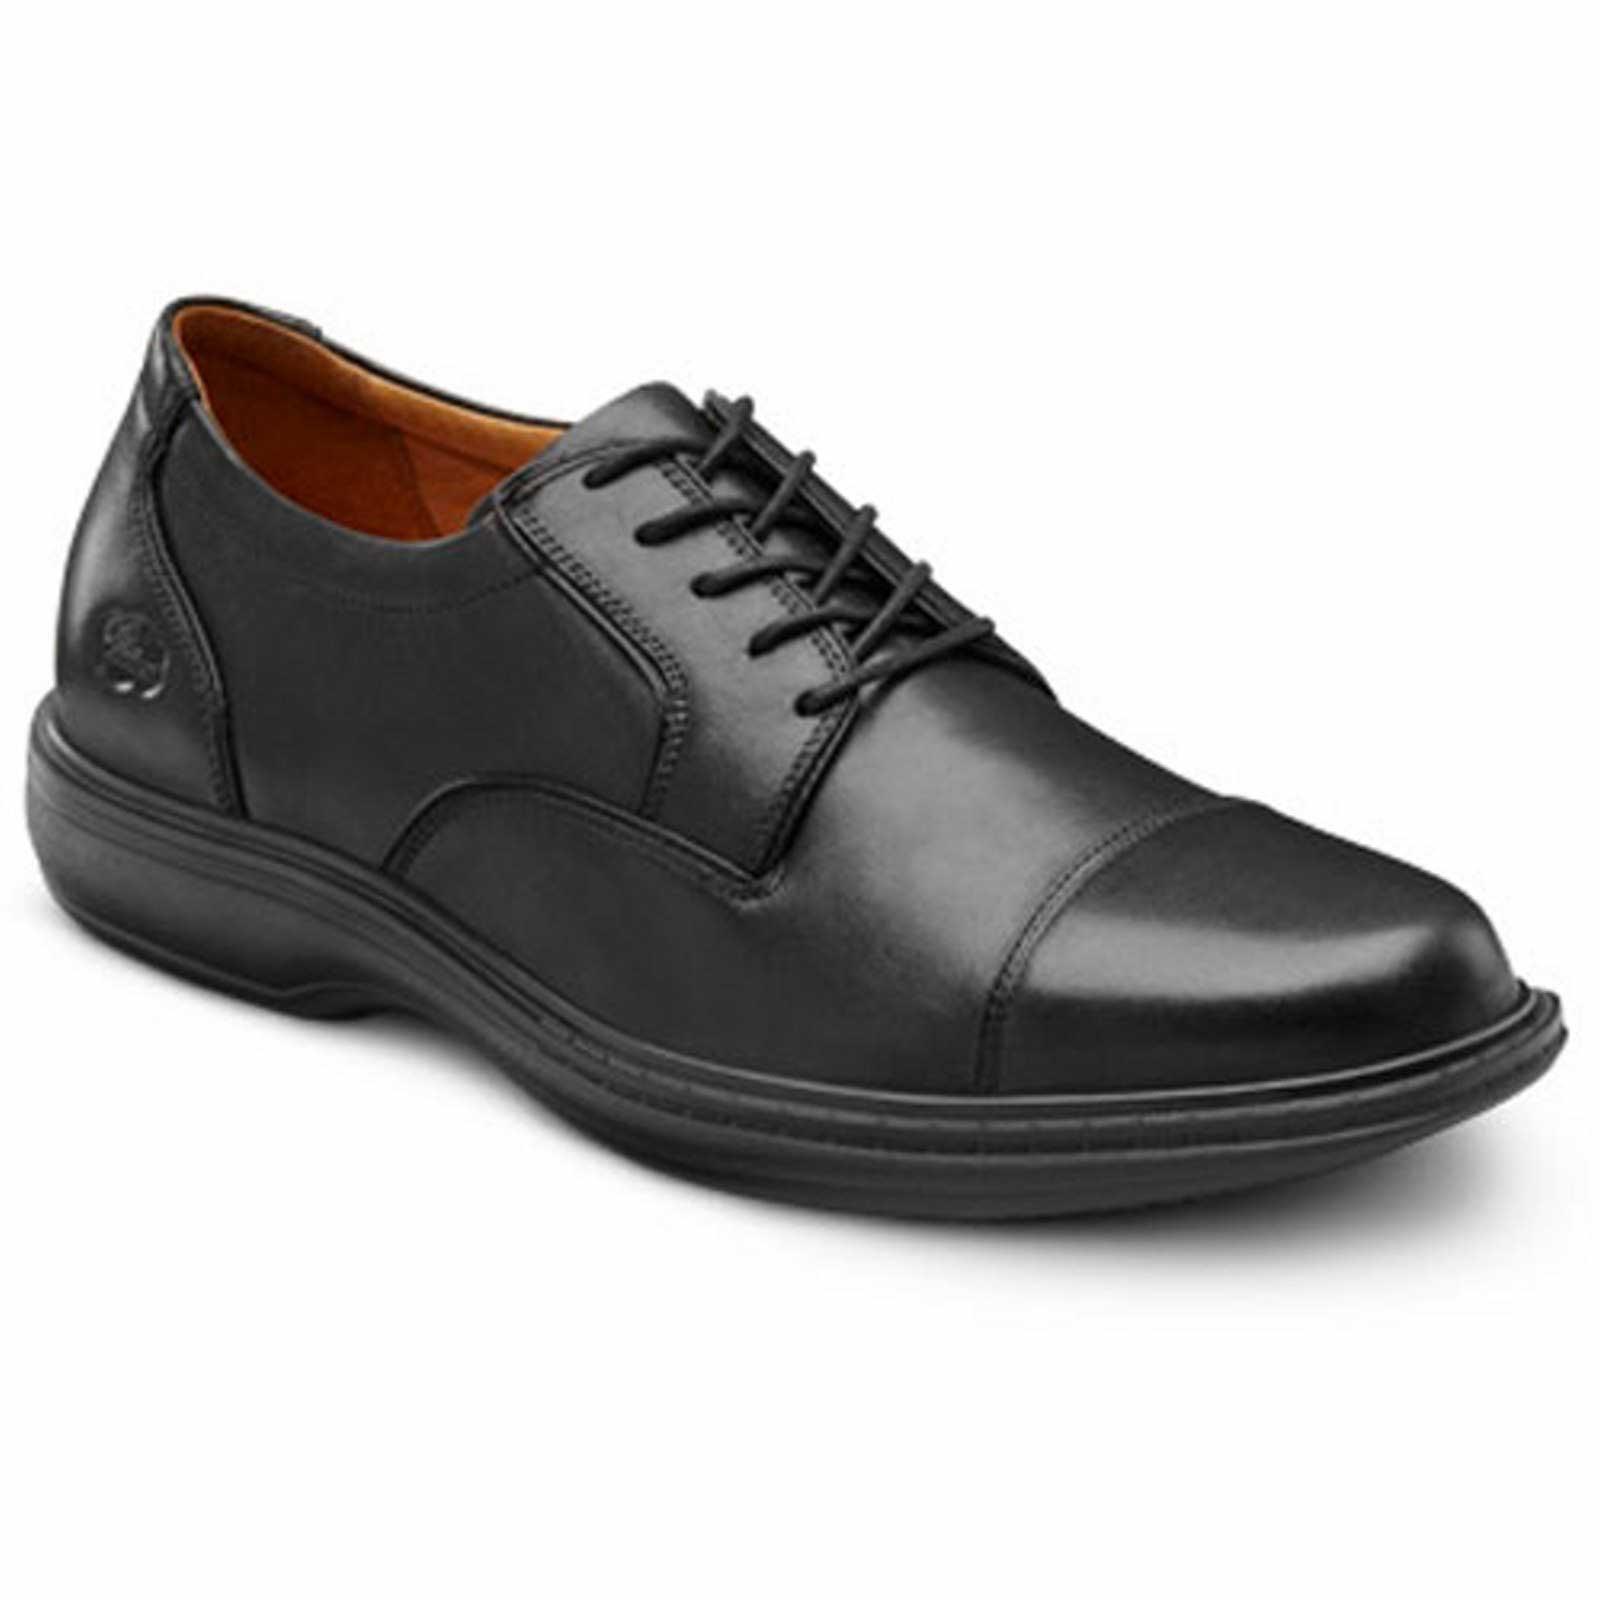 Dr Comfort Shoes - Captain - Men's Therapeutic Diabetic Shoe with Gel Plus Inserts - Dress - Medium (D) - Extra Wide (4E) - Extr at Sears.com